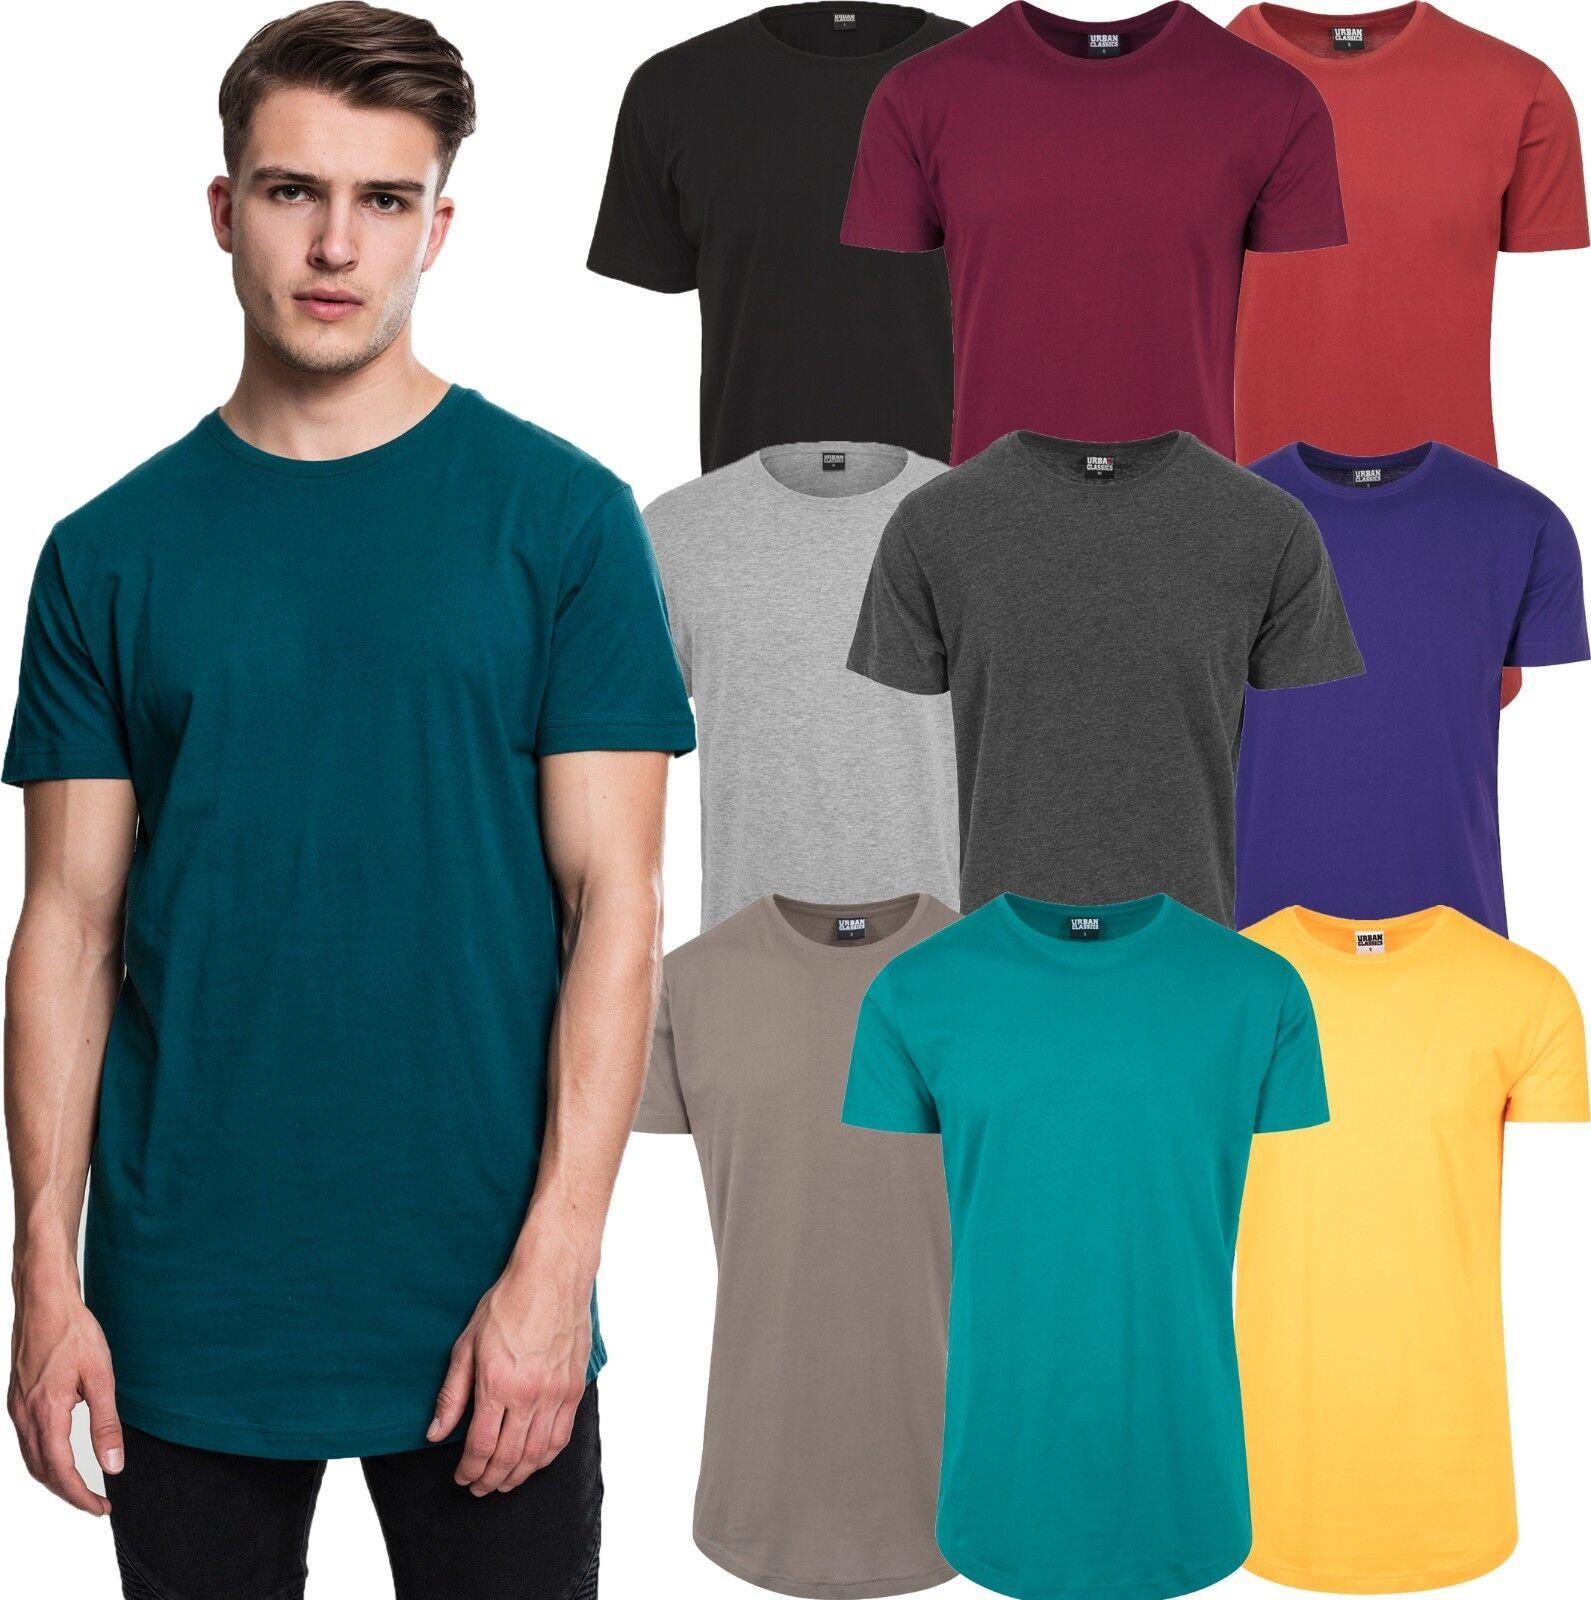 ae88c0fe73f0 Urban Classics Herren T-Shirt extra lang long Shirt Tee shaped ...